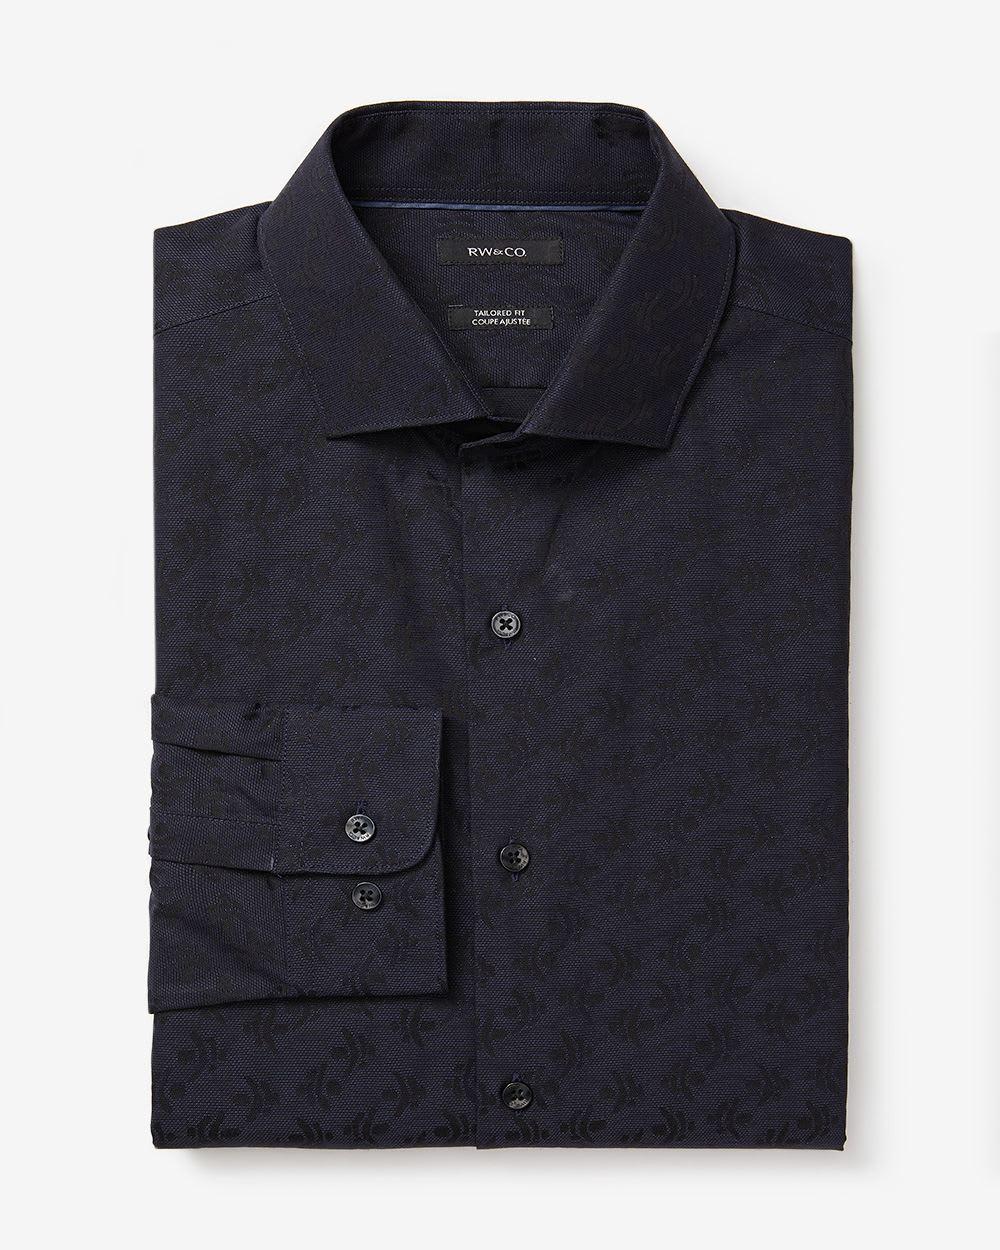 Tailored fit two tone jacquard dress shirt rw co for Tailored fit dress shirts